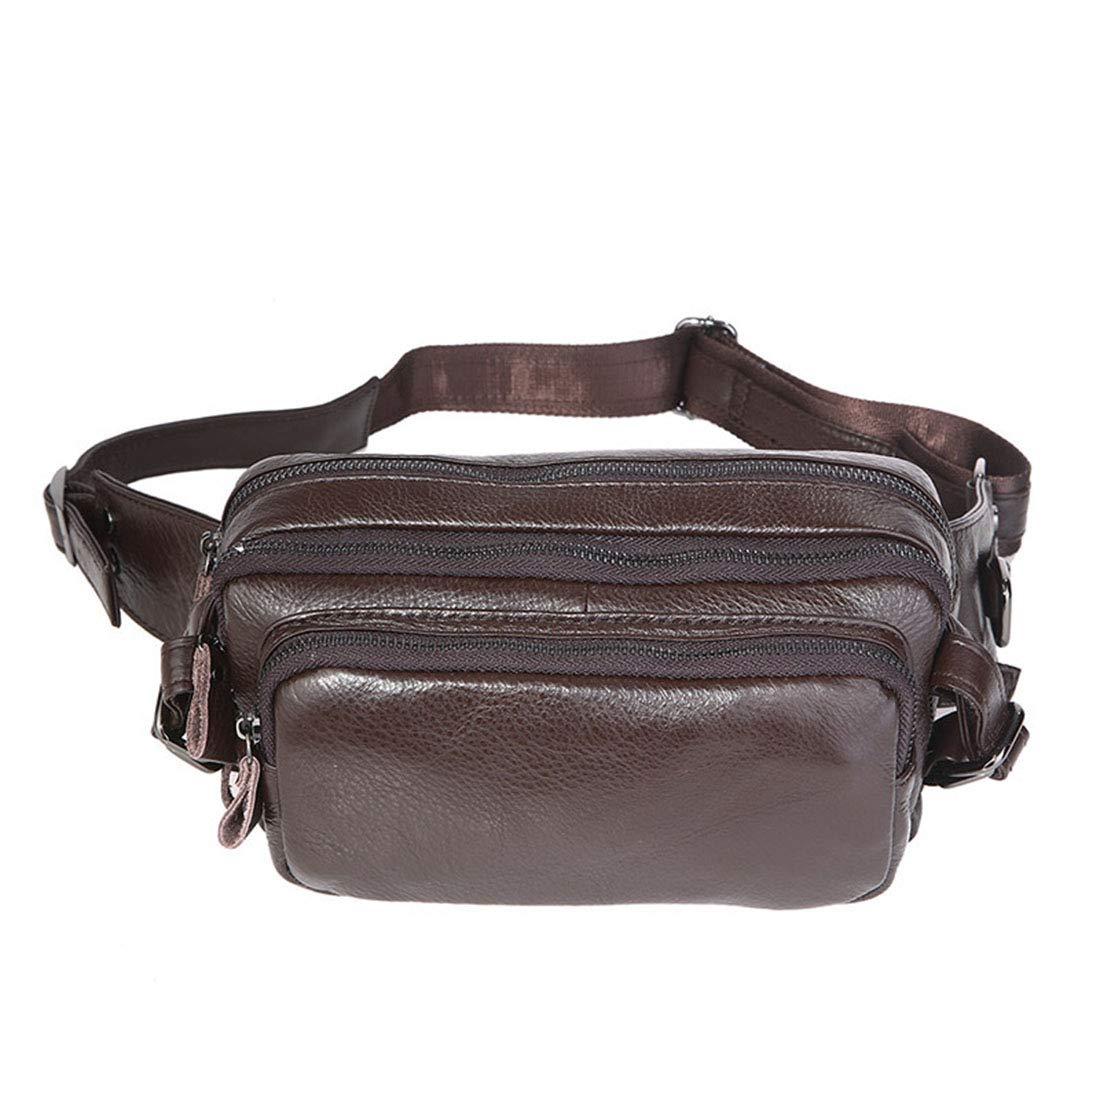 RABILTY Fanny Pack Black Waist Bag Travel Hiking Hip Bum Purse Brown Cowhide Running Belt Waist Pack Color : Photo Color